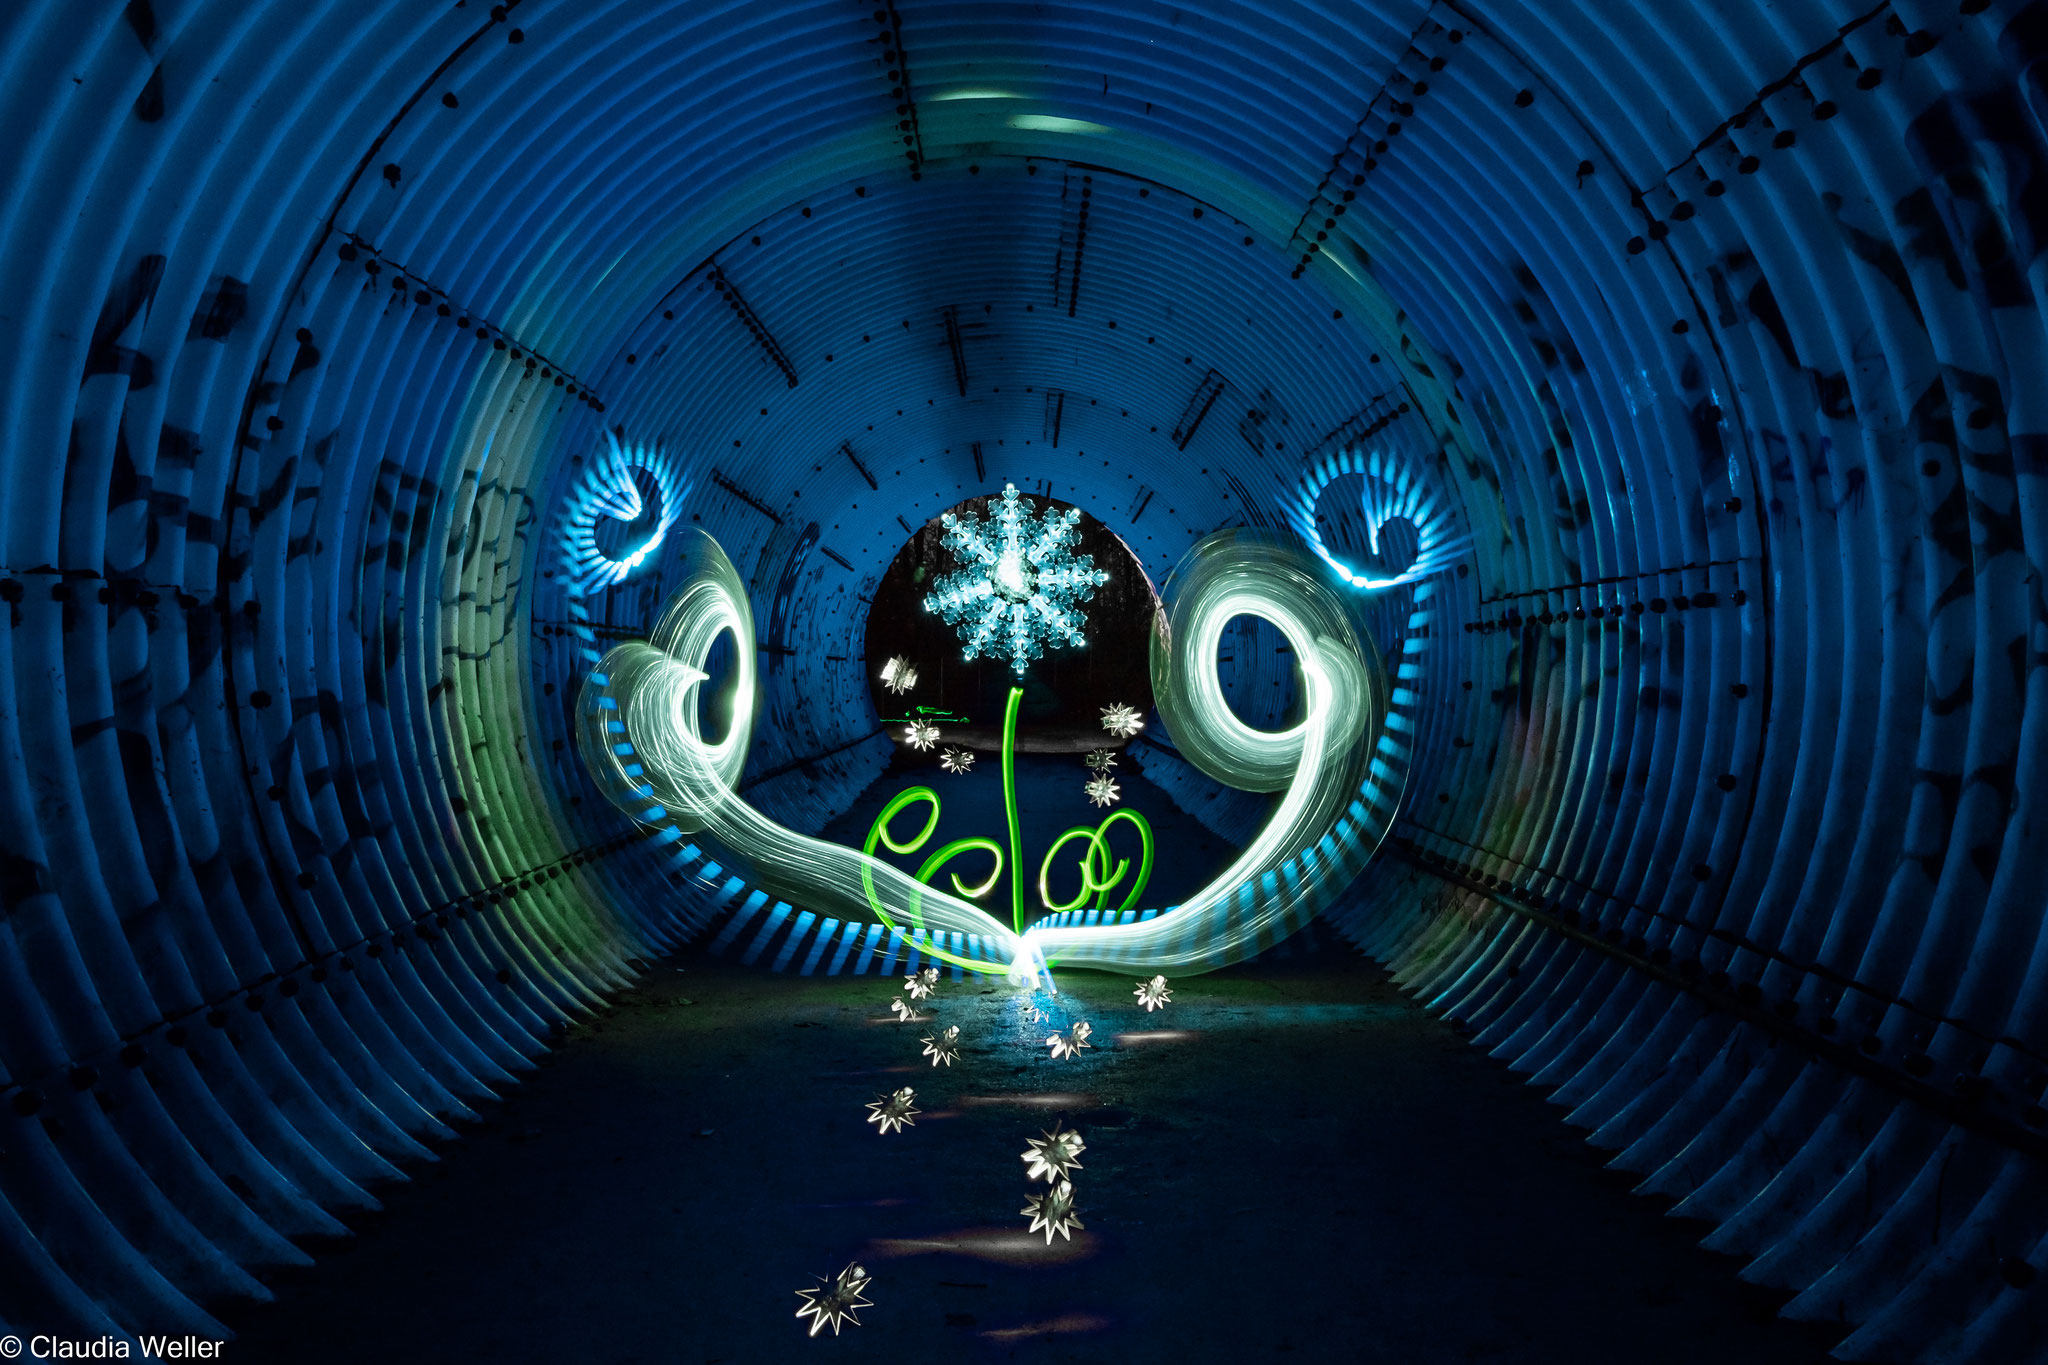 Eiskristallblömke im Tunnel